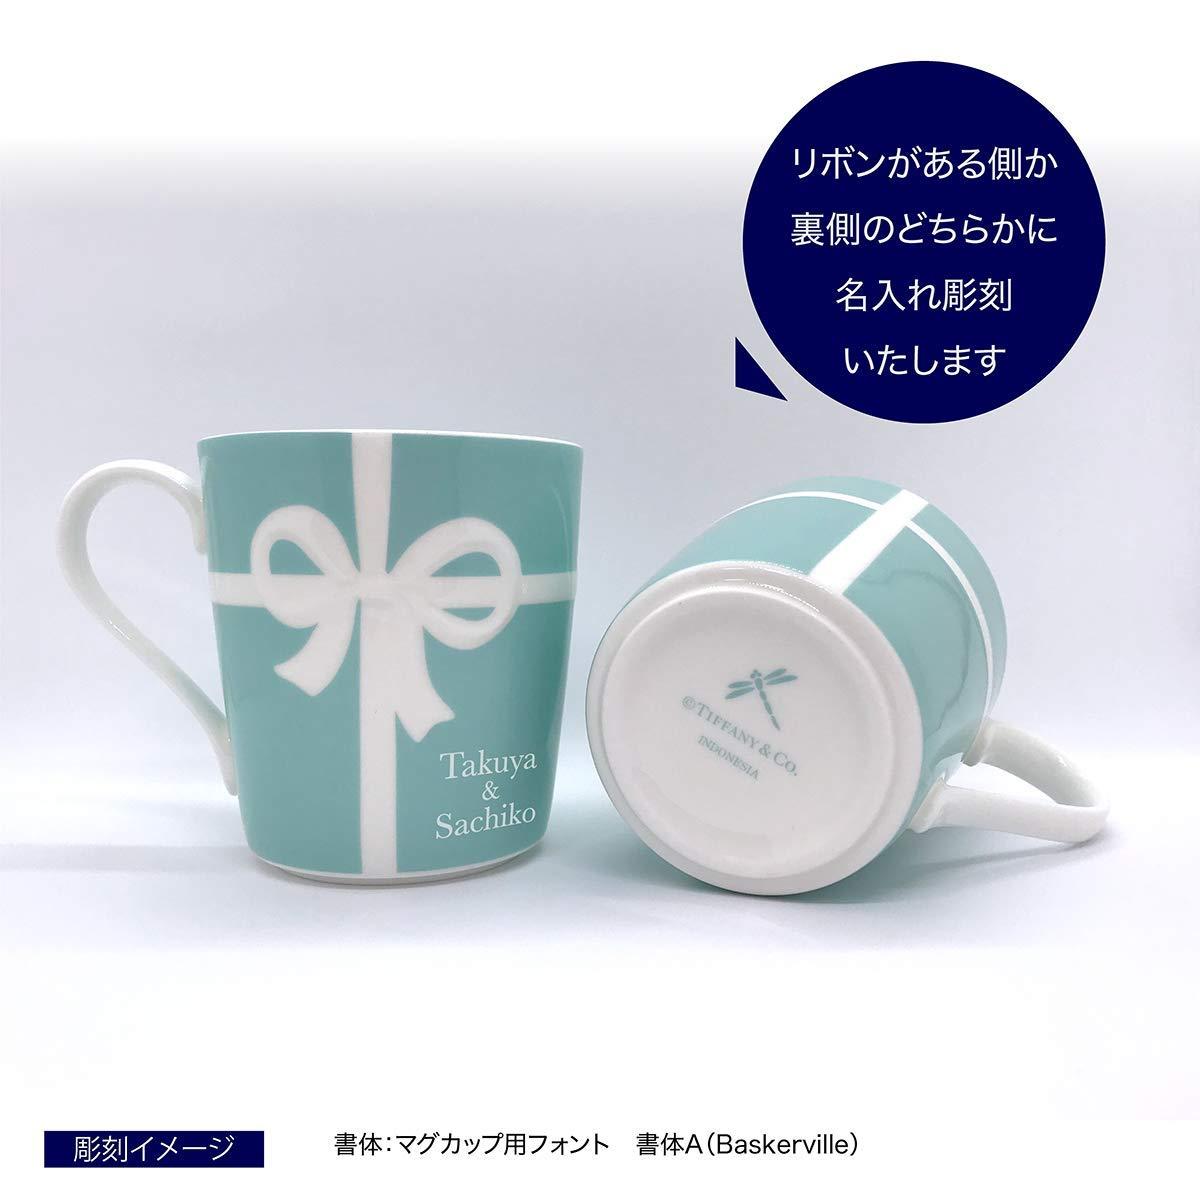 huge discount 08cbb 6d1ec ブルーボックスマグカップ 【ティファニー手提げ紙袋付き送料 ...